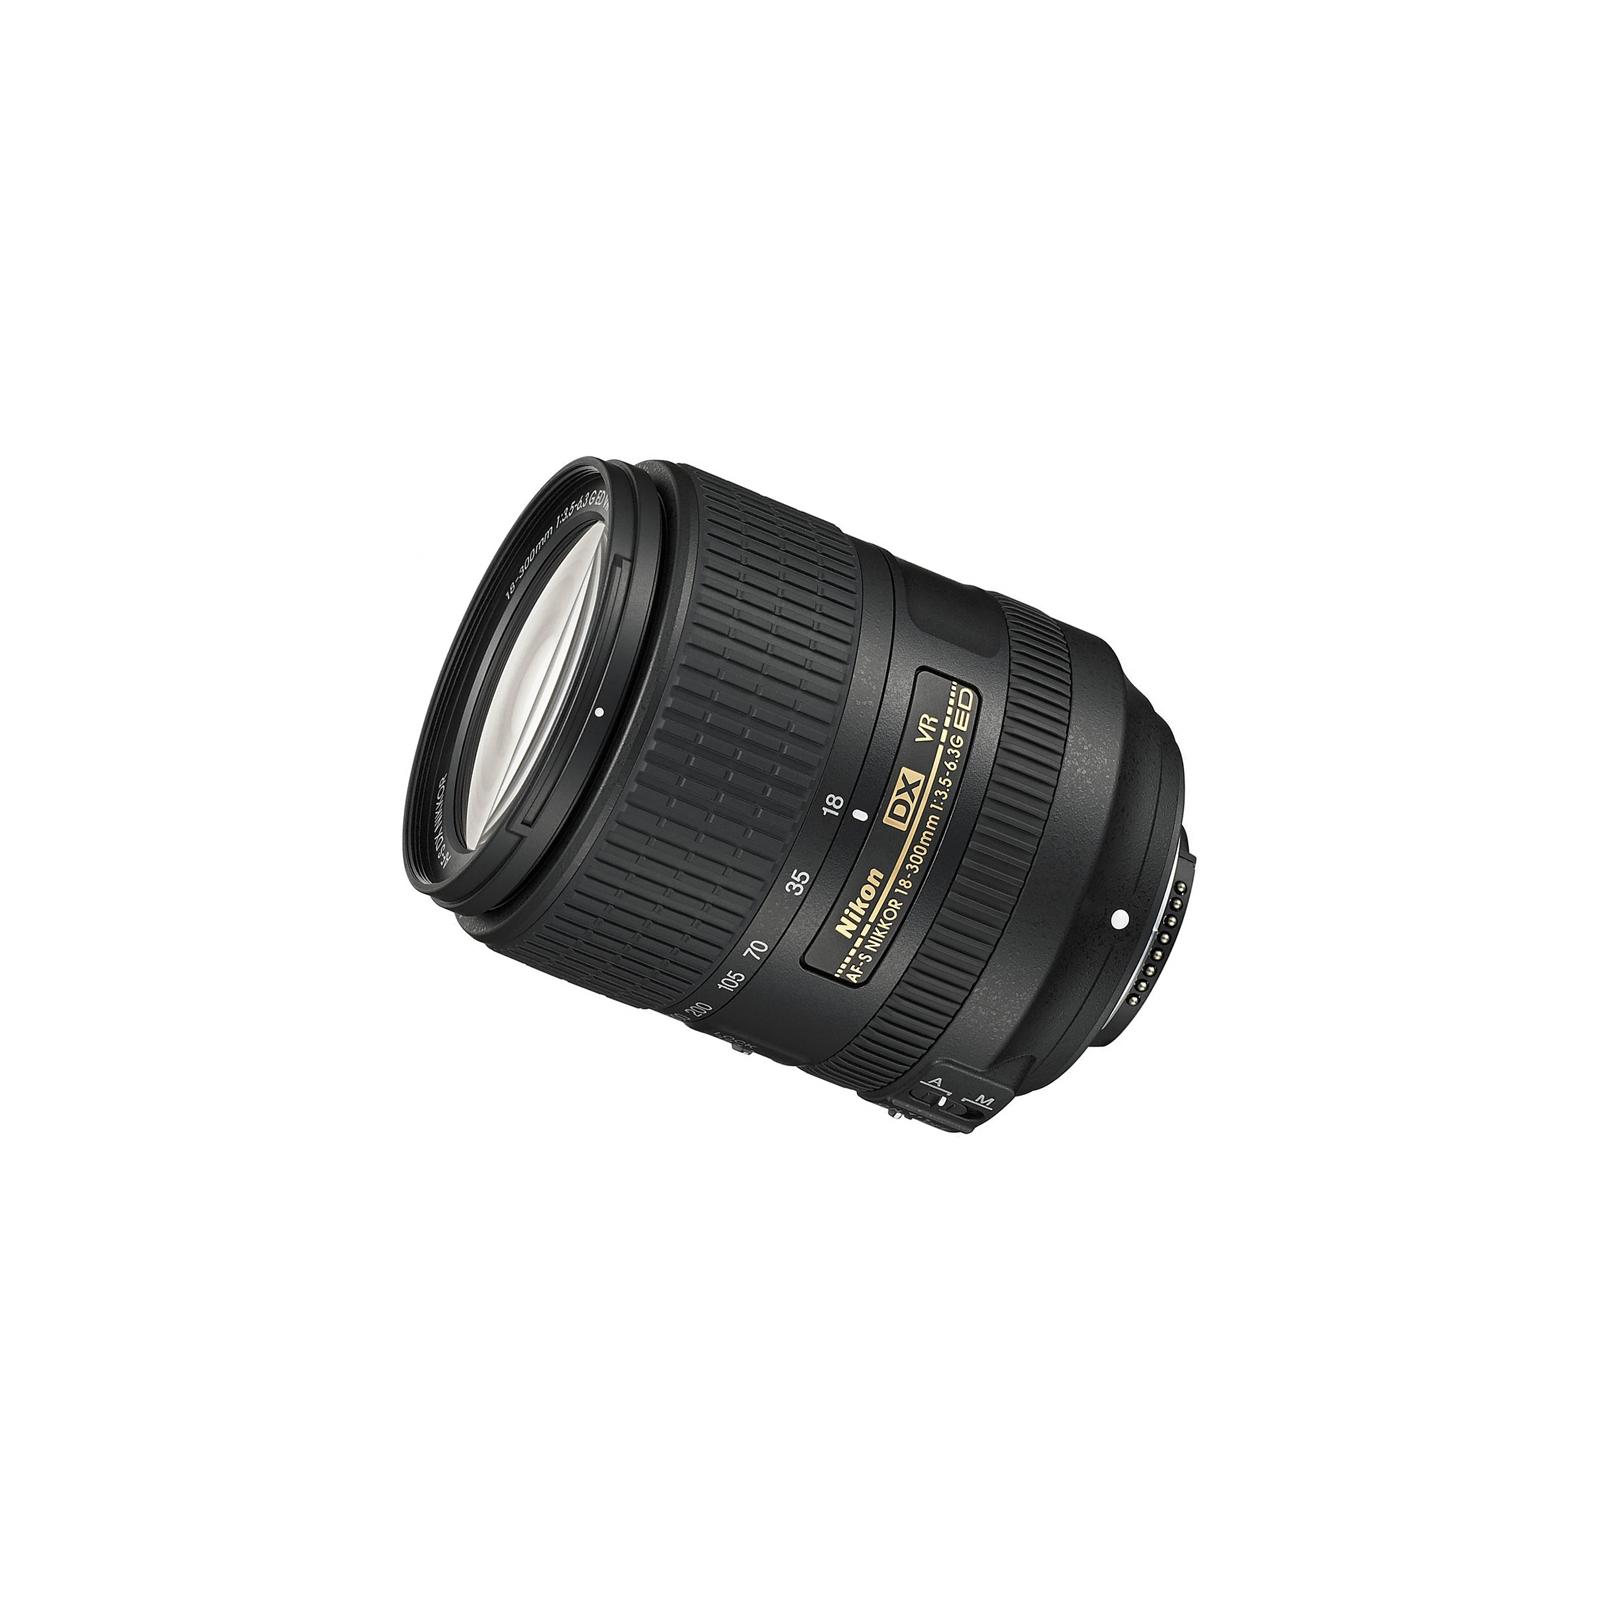 Объектив Nikon 18-300mm f/3.5-6.3G ED AF-S DX VR (JAA821DA) изображение 2